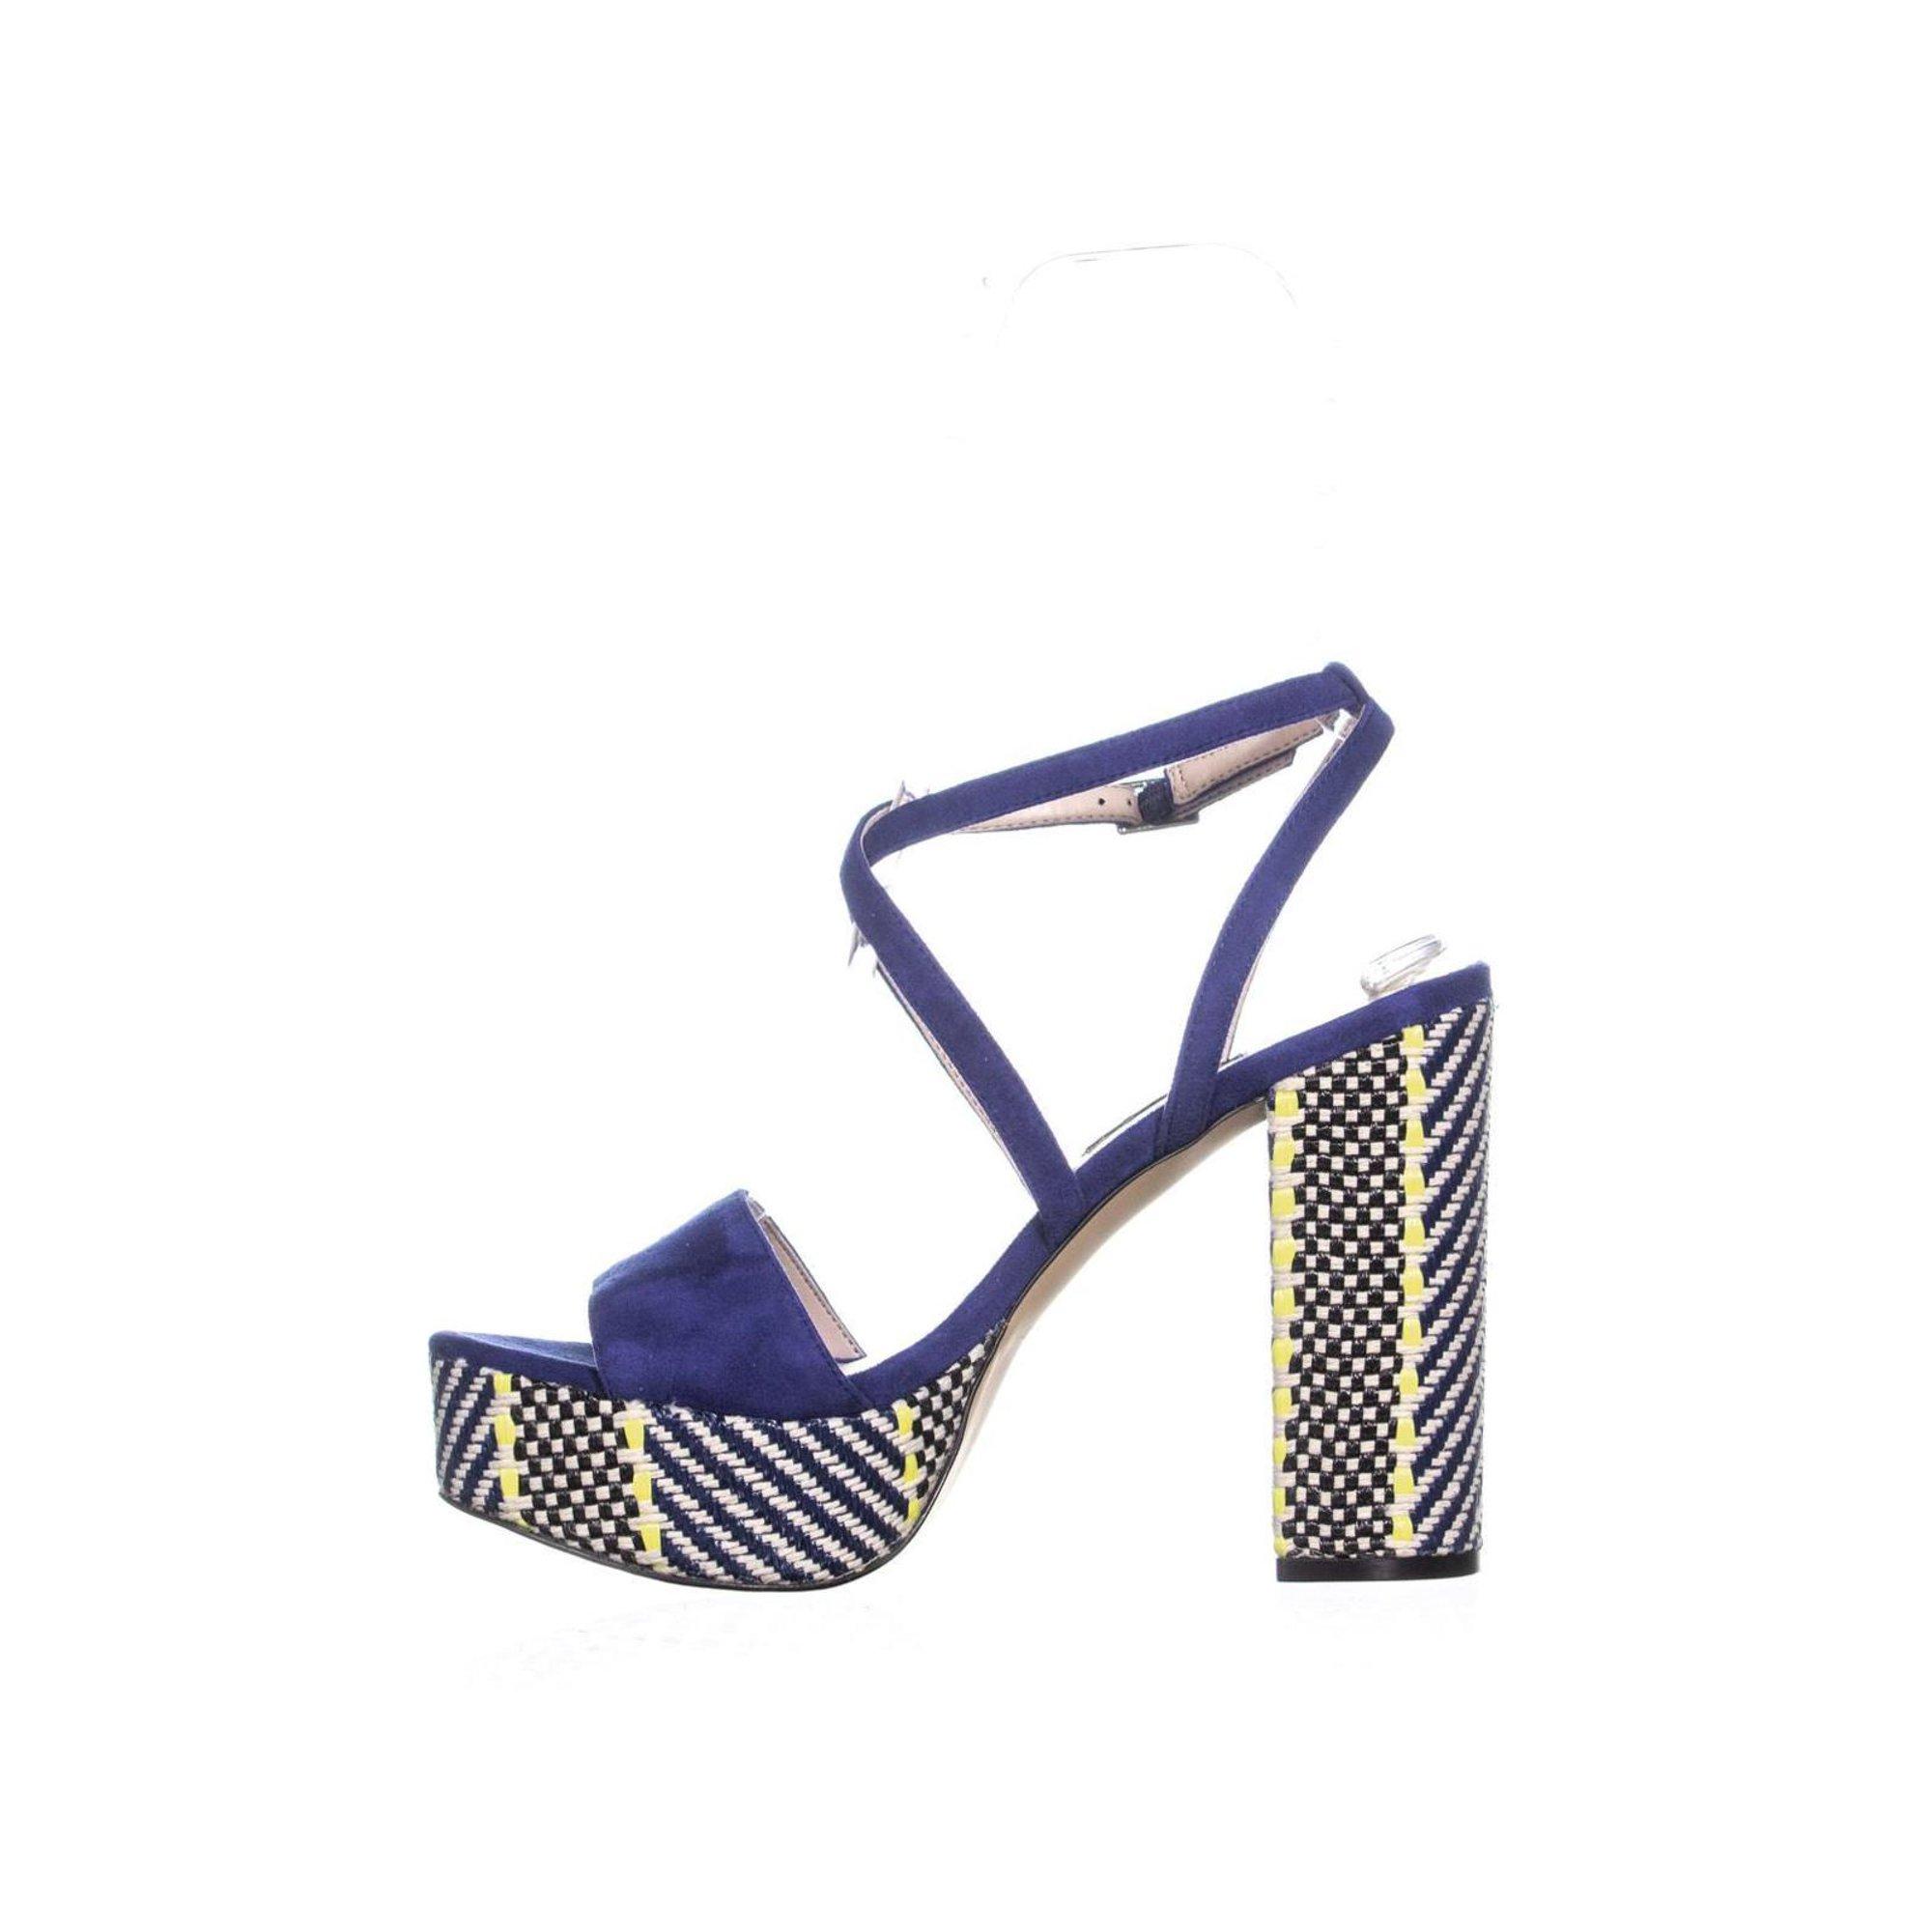 b84e6de404b8 Nine West Markando Block Heel Platform Strappy Sandals